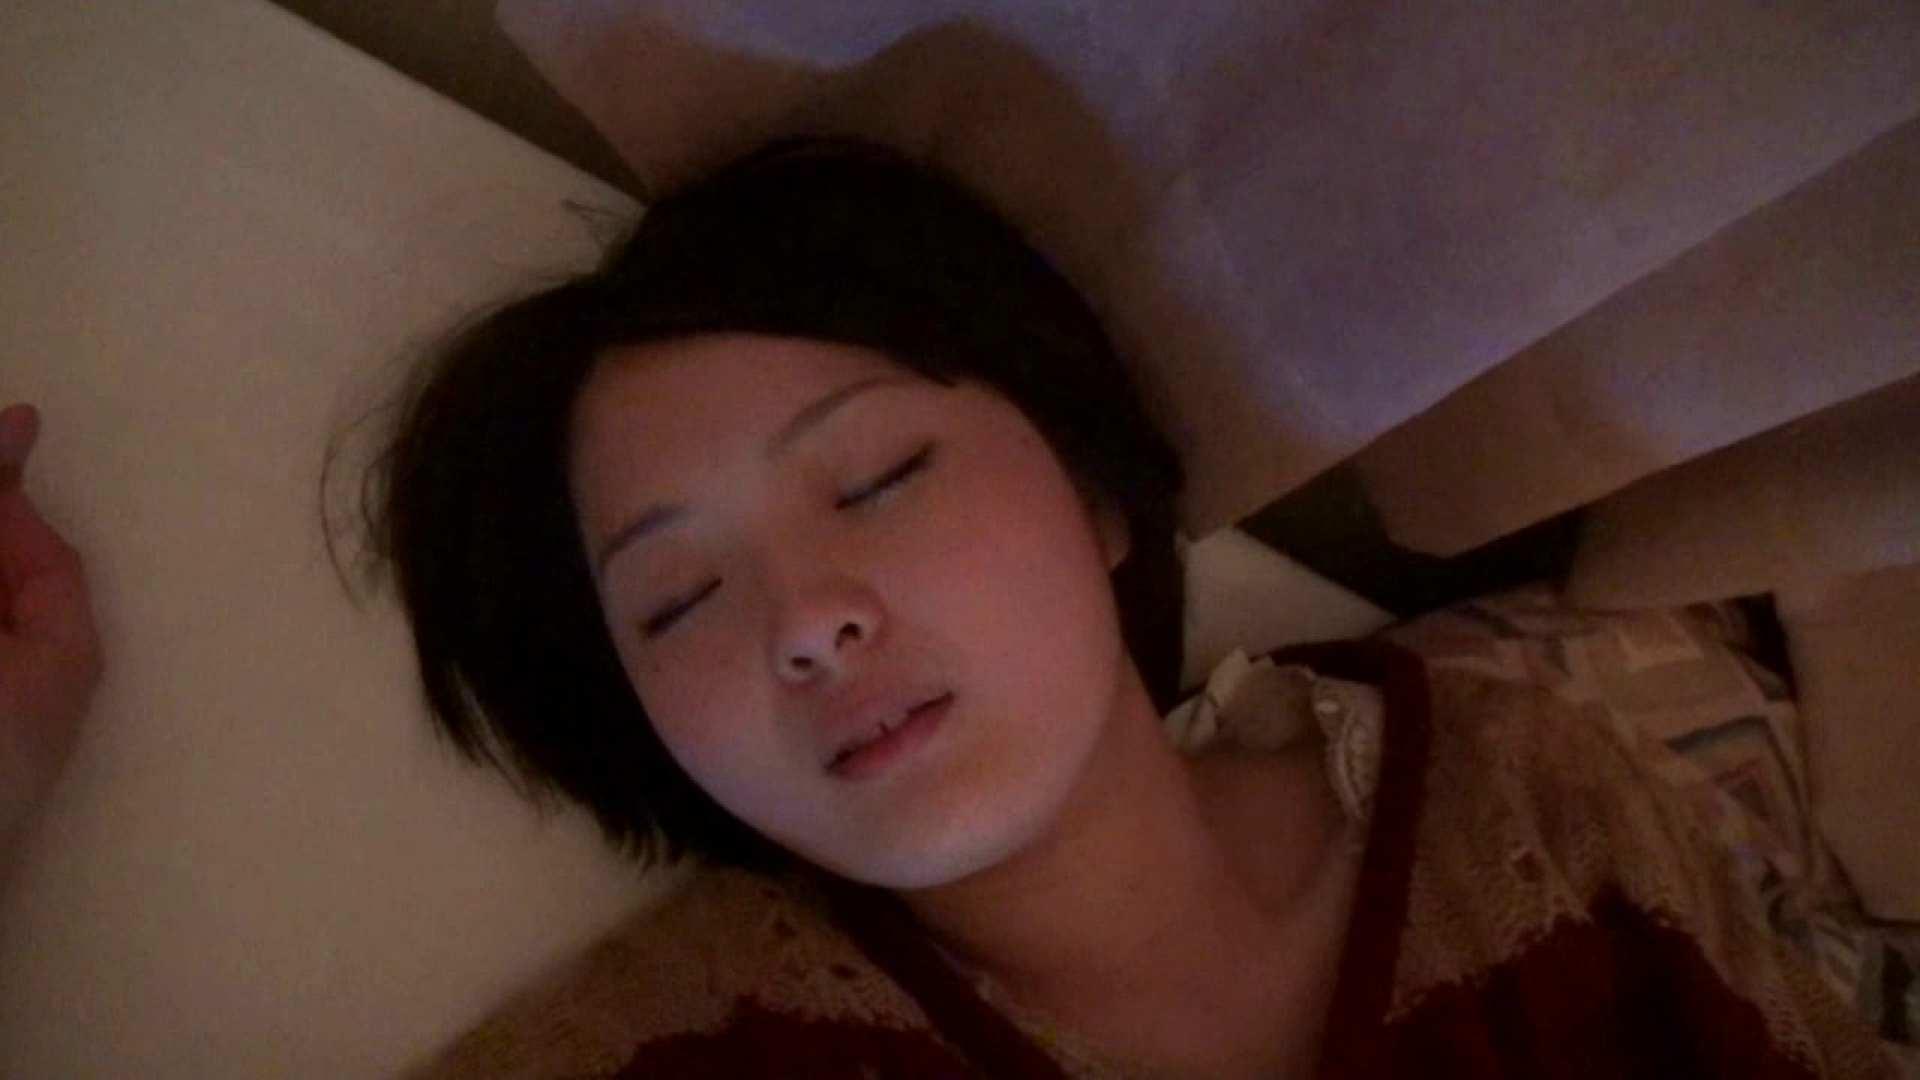 vol.29 【KTちゃん】現役JD居酒屋アルバイト 2回目? OLのボディ  86PIX 22